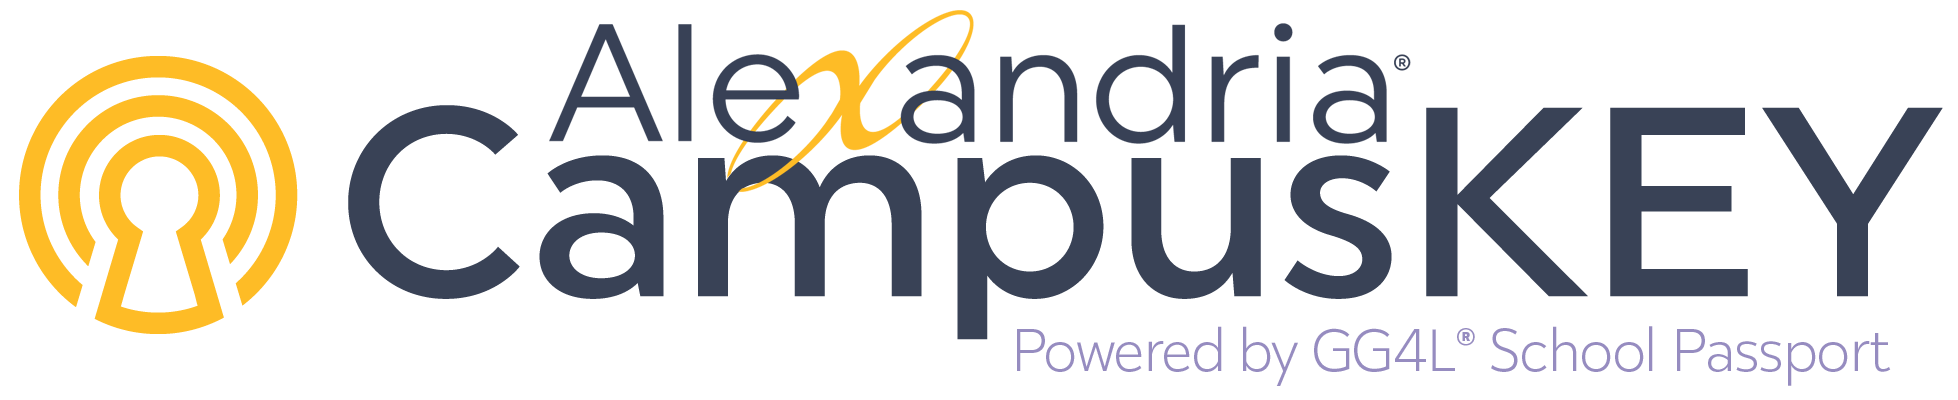 Alexandria-CampusKey-GG4L-Blue2